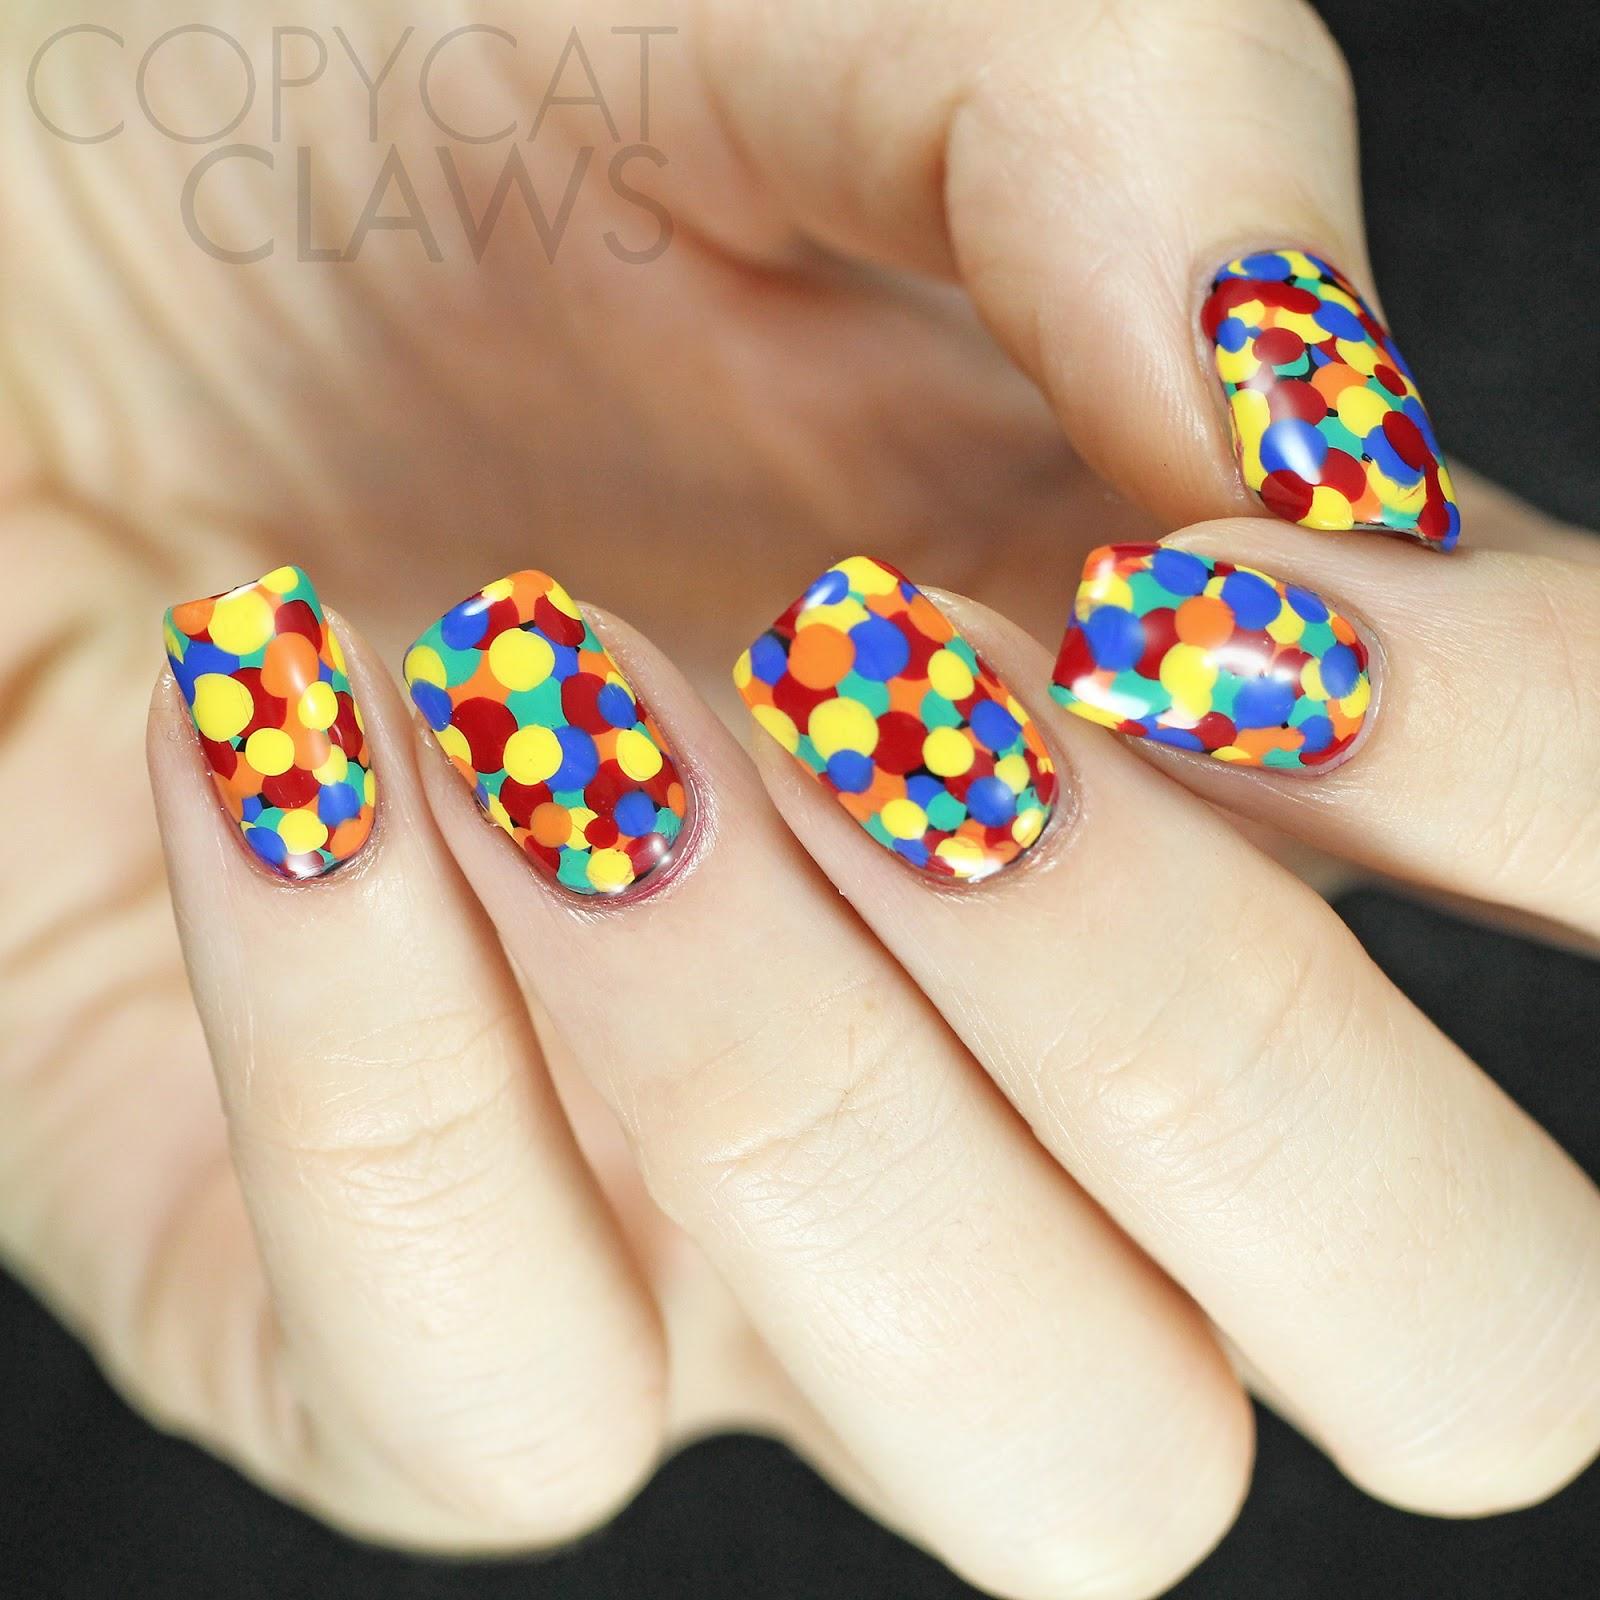 Copycat Claws: Primary Color Dotticure